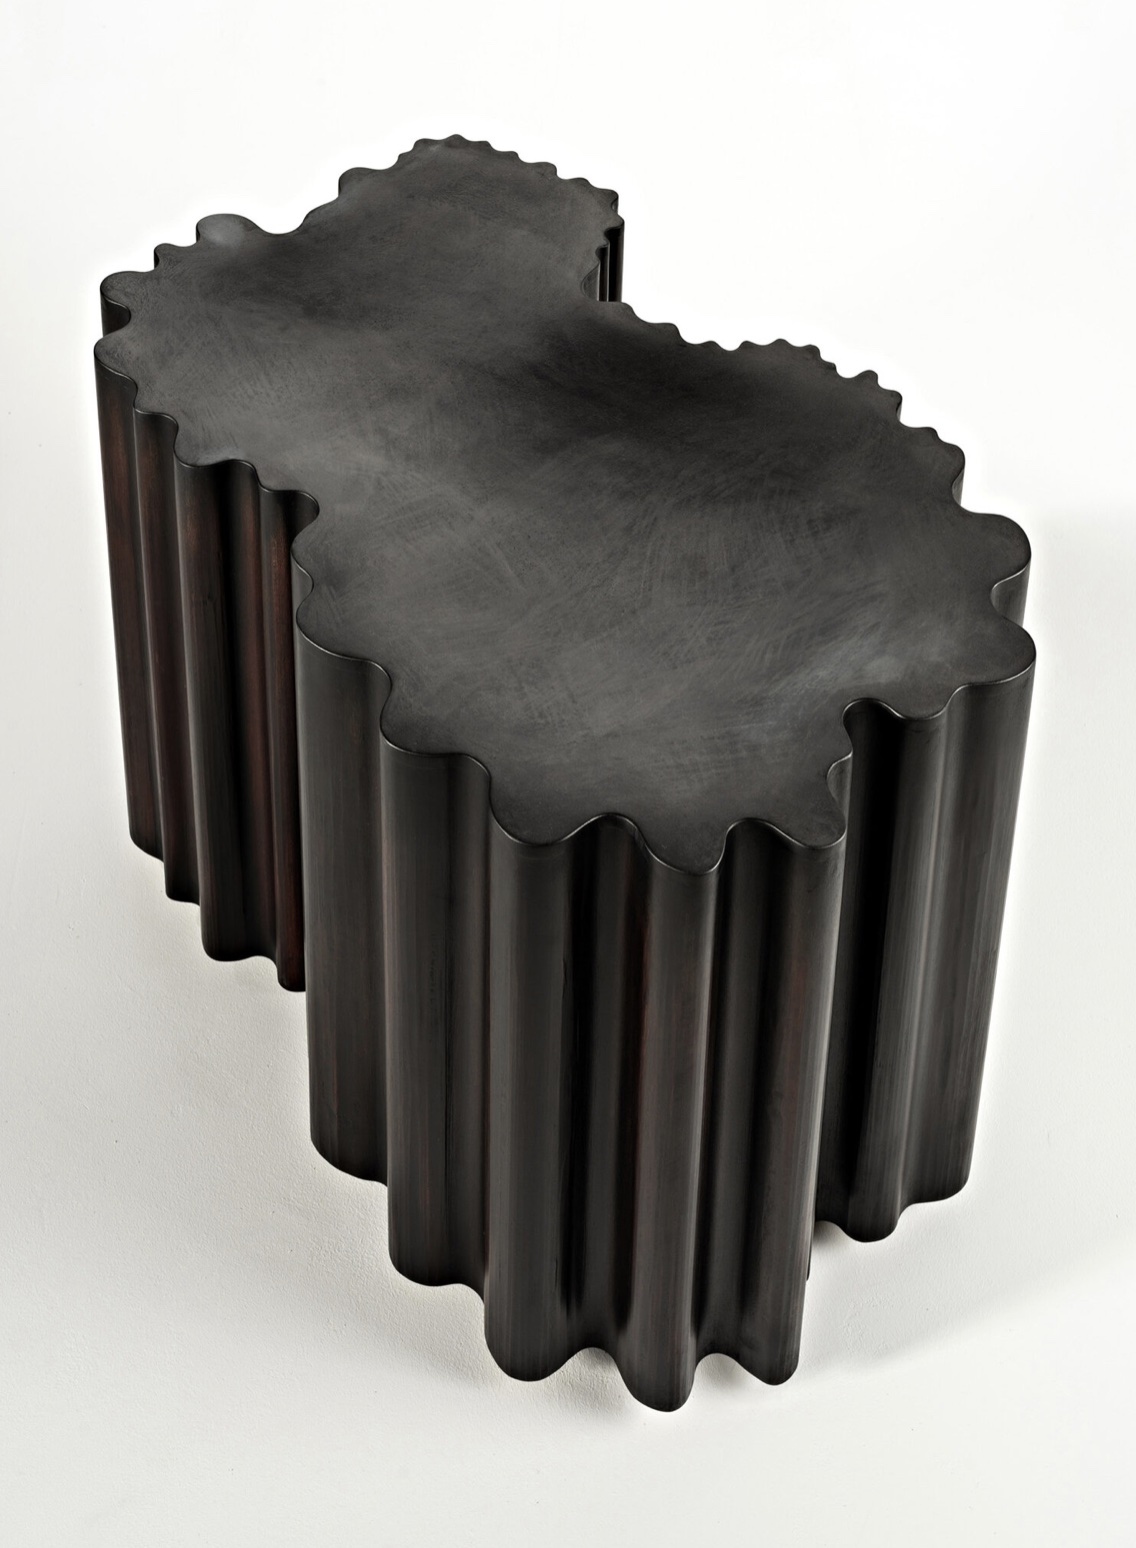 Black Hole Bench 60219, 2019, by Artist Christopher Kurtz.